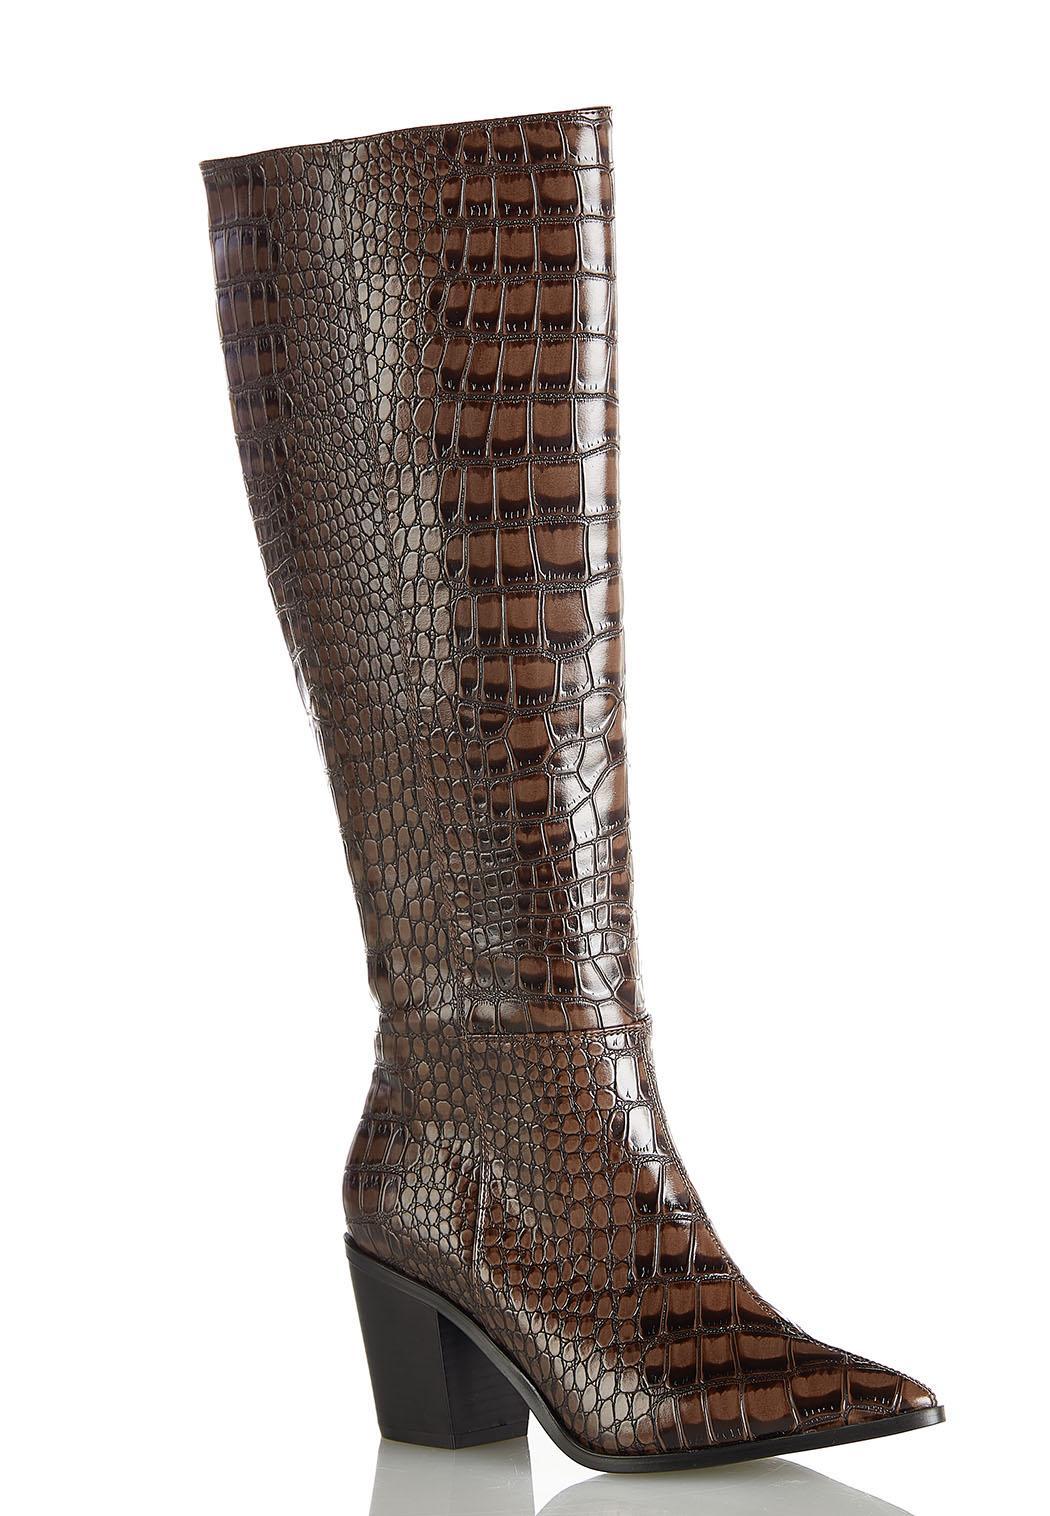 Tall Crocodile Textured Boots